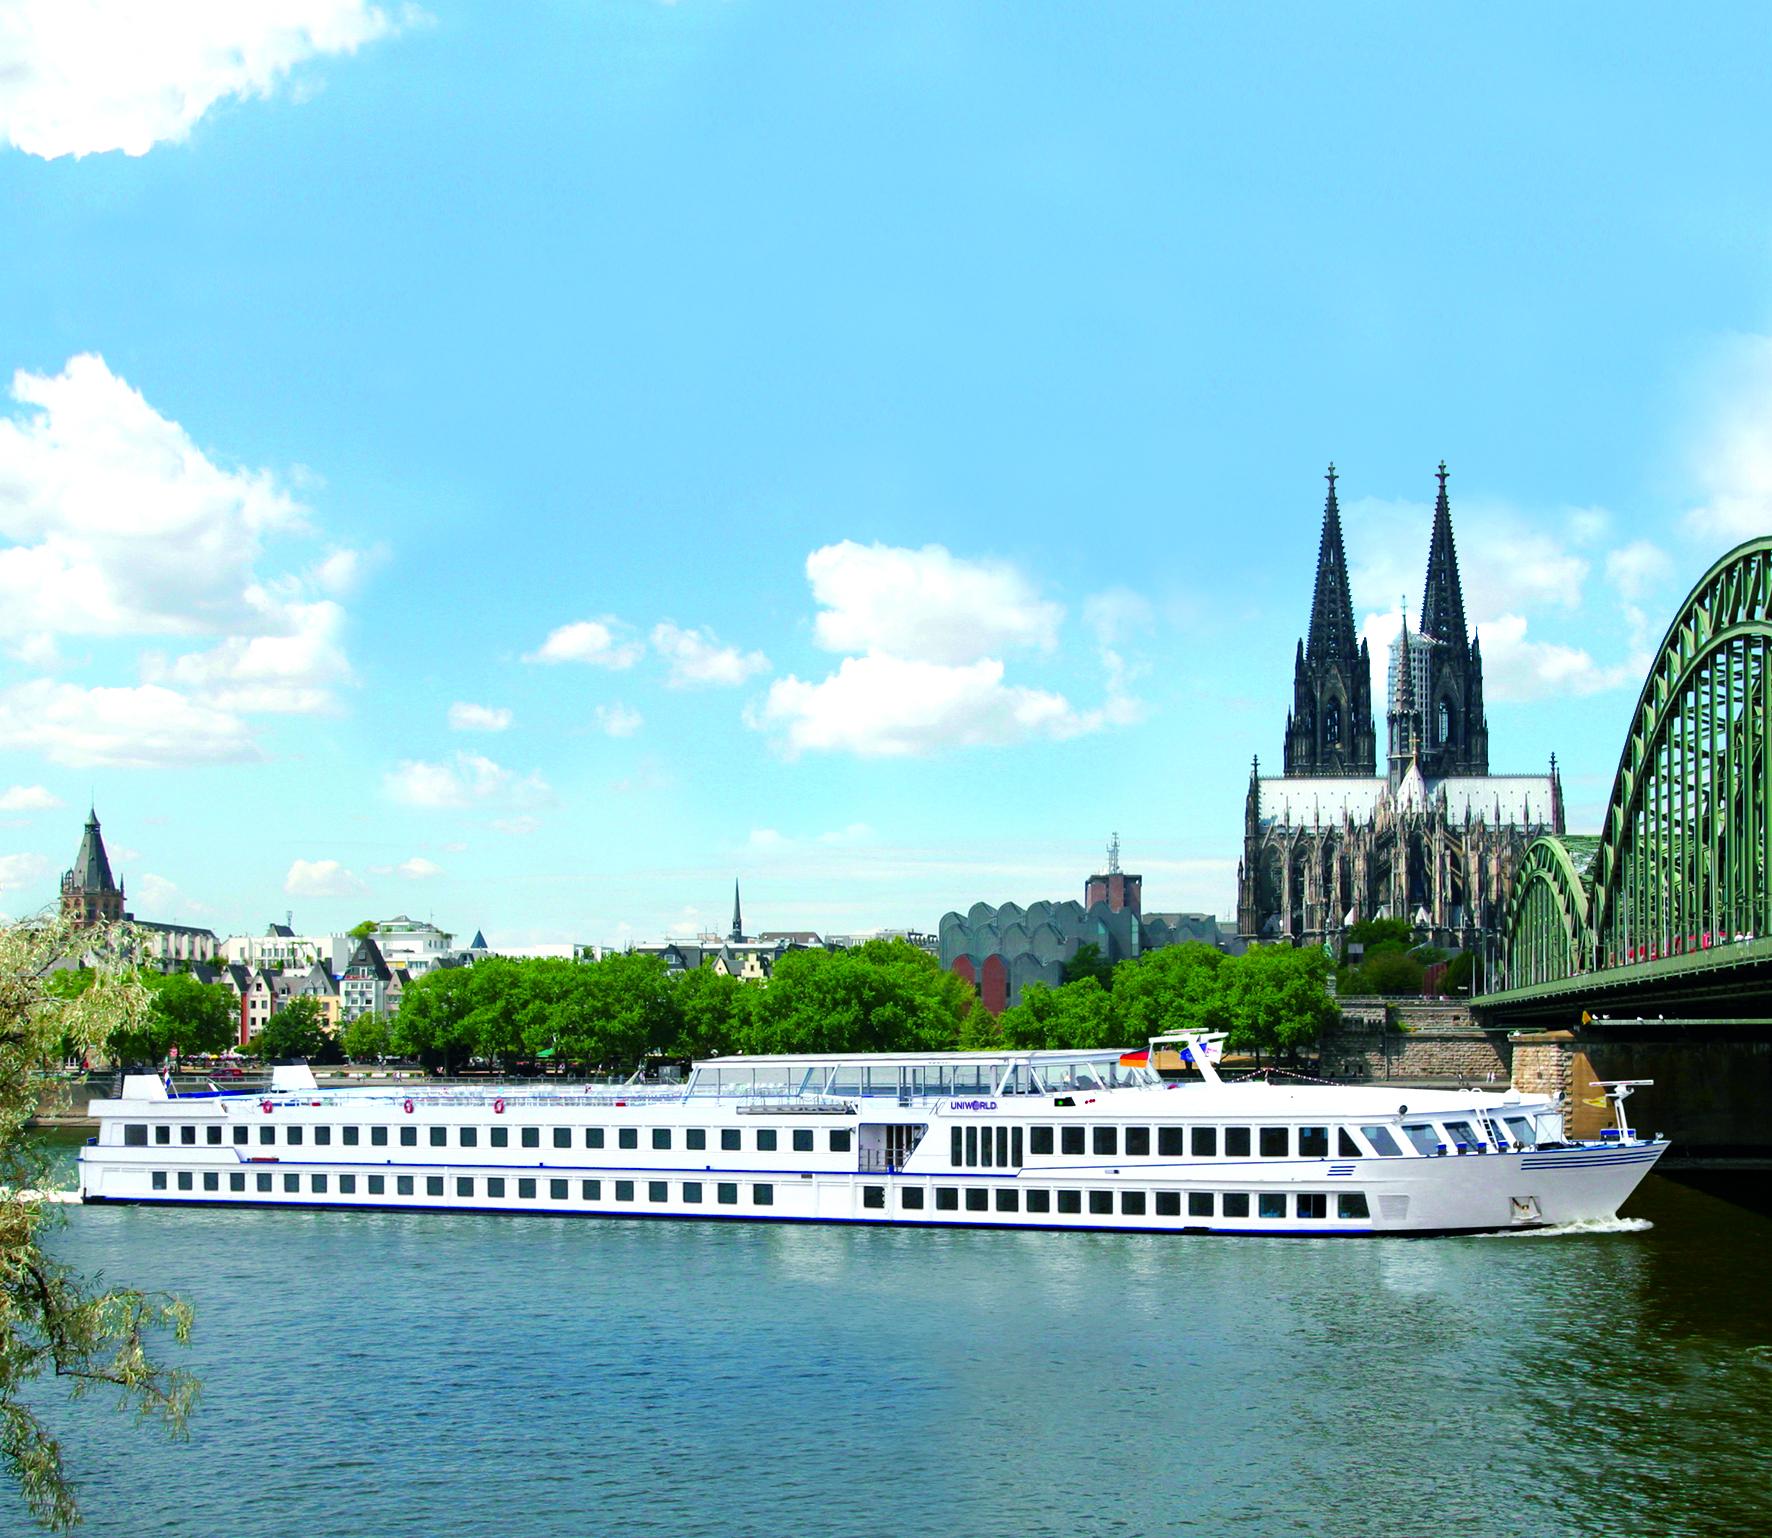 5 Star Luxury River Cruises Through Eurooe: Big Fat Wholesaler Wrap